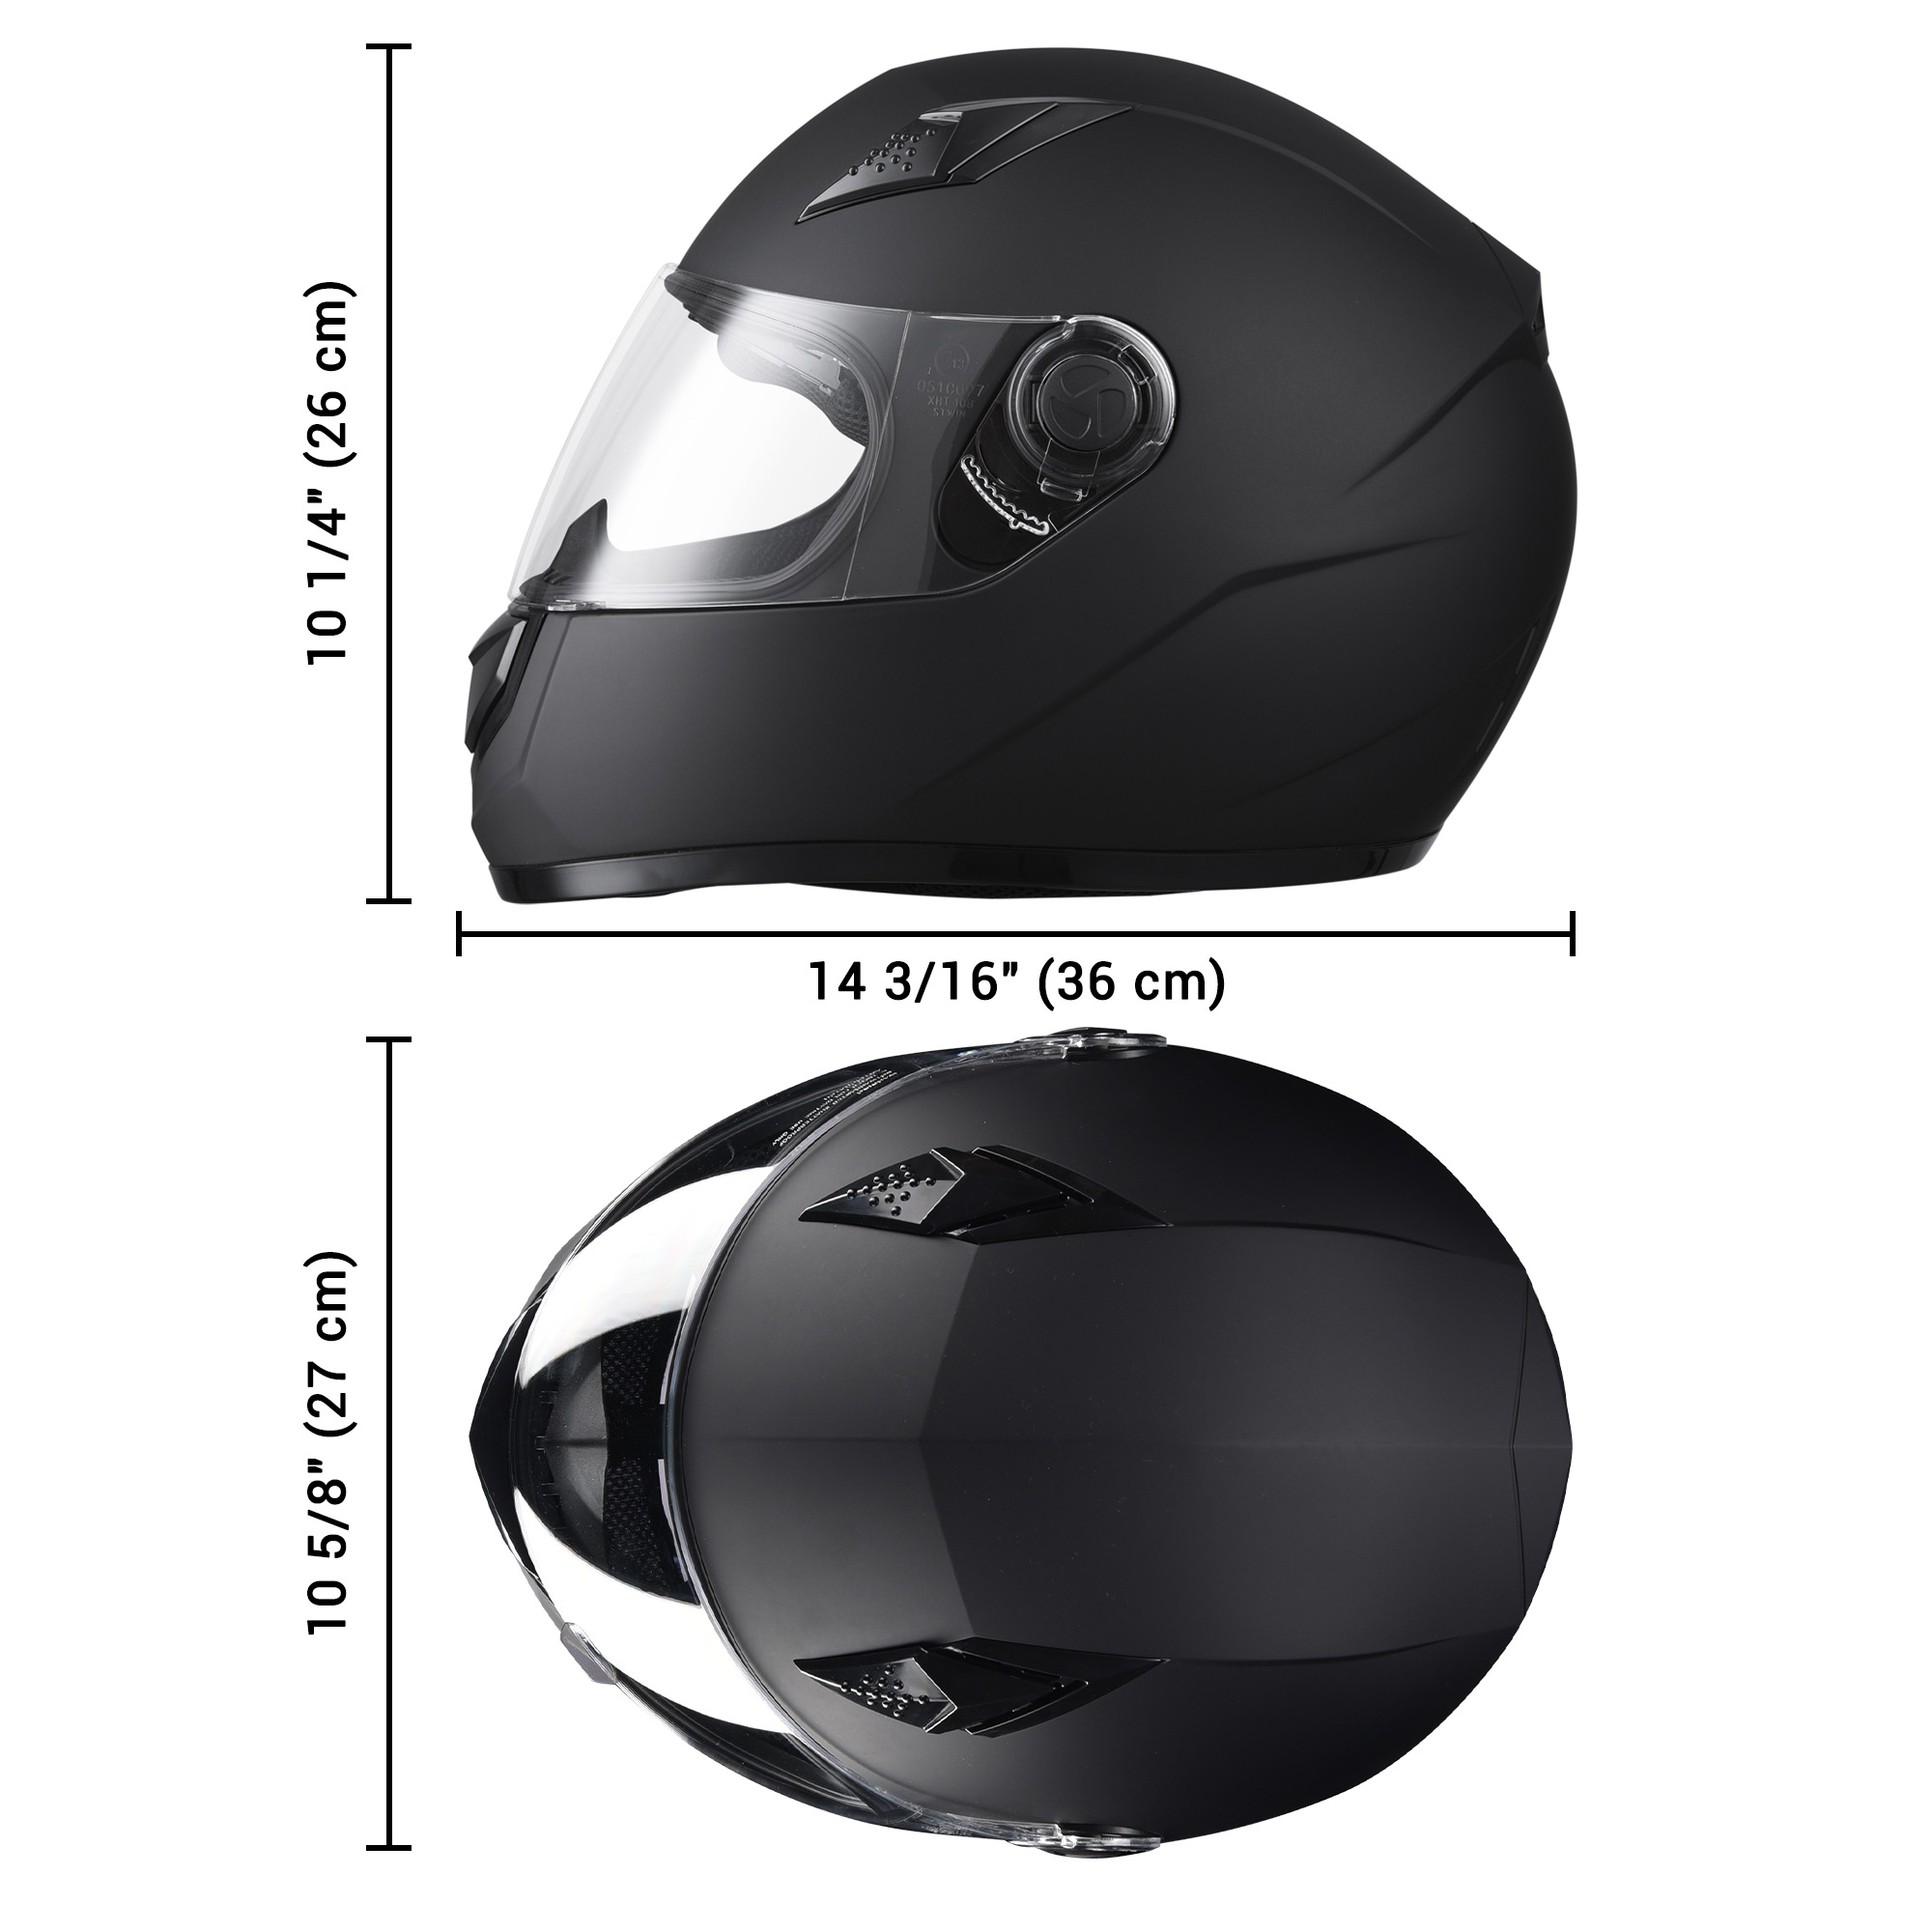 miniature 70 - AHR K12 Full Face Motorcycle Helmet DOT Air Vents Clear Visor Racing S M L XL